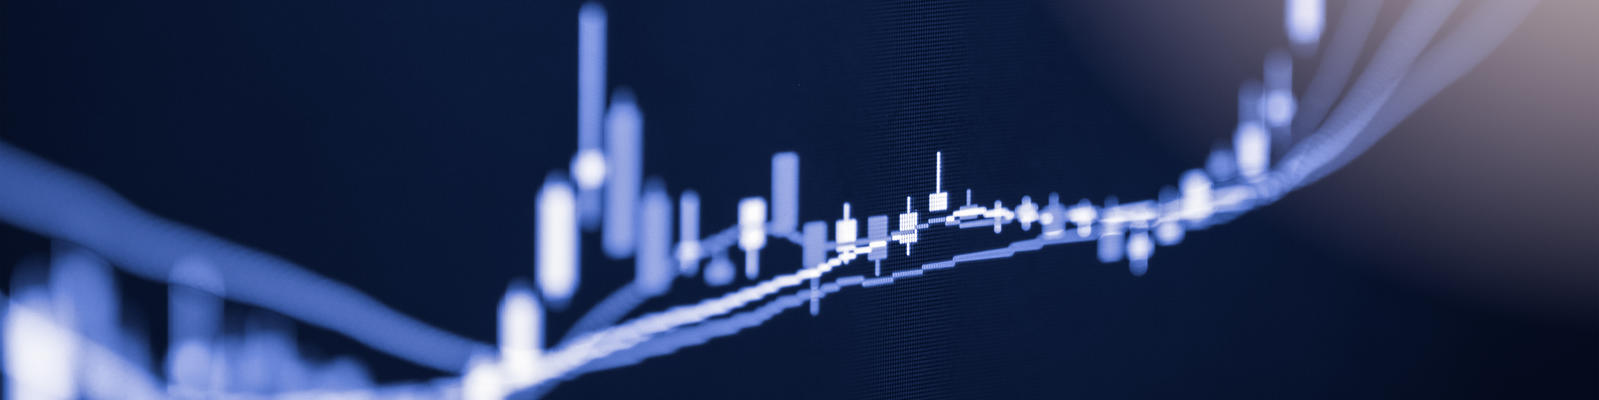 Cruise Line Stocks and Perks for Shareholders (Photo: Phongphan/Shutterstock.com)